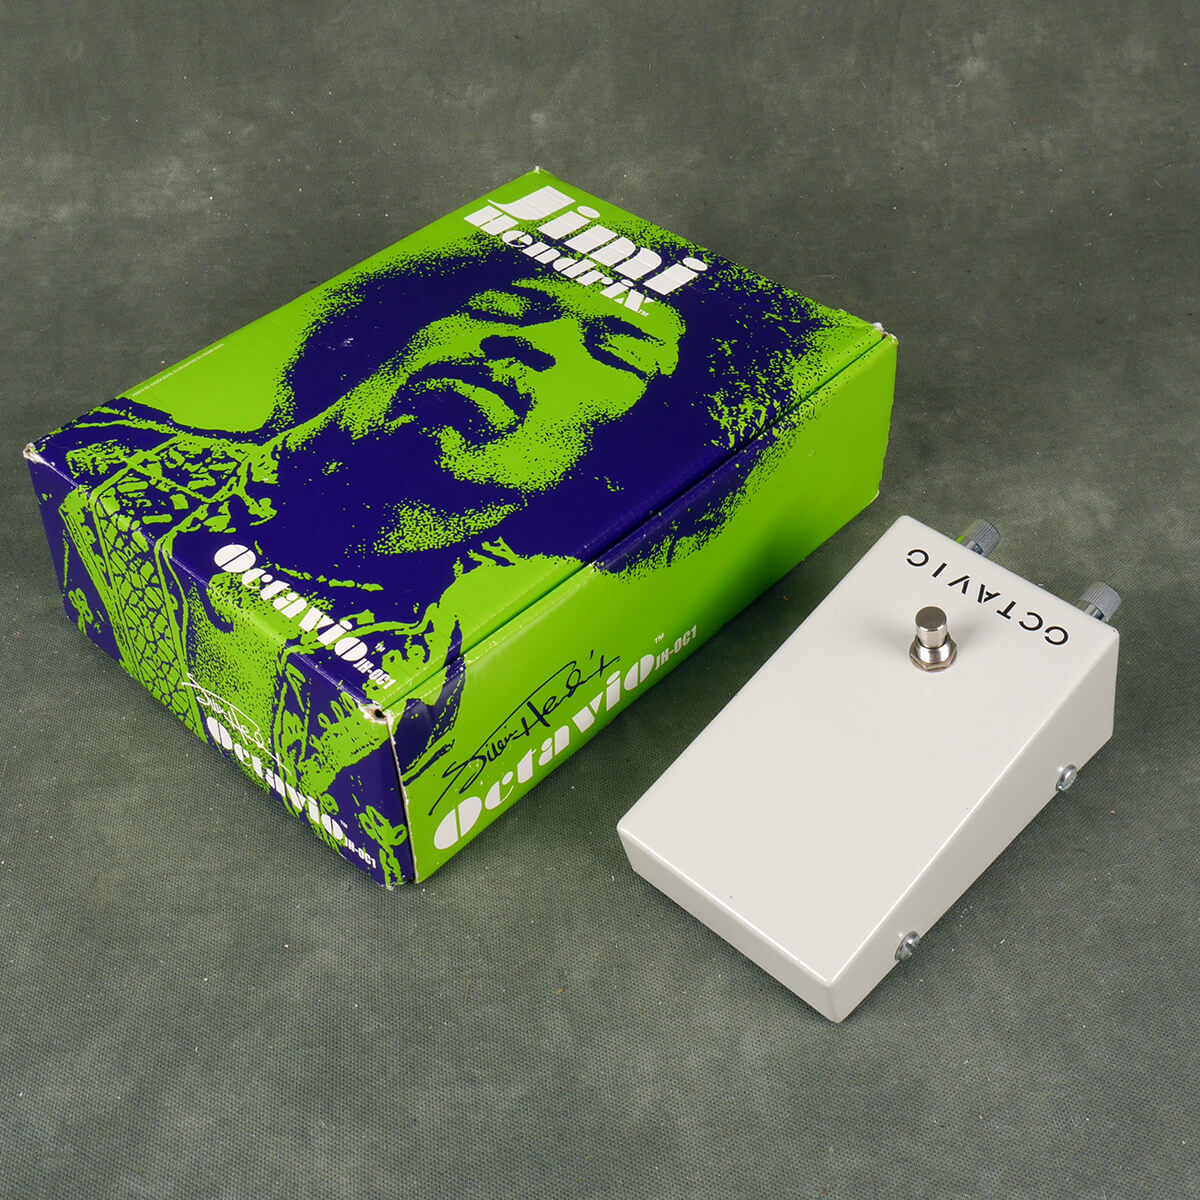 Jim Dunlop JHOC1 Octavio Octave FX Pedal w/Box & PSU - 2nd Hand